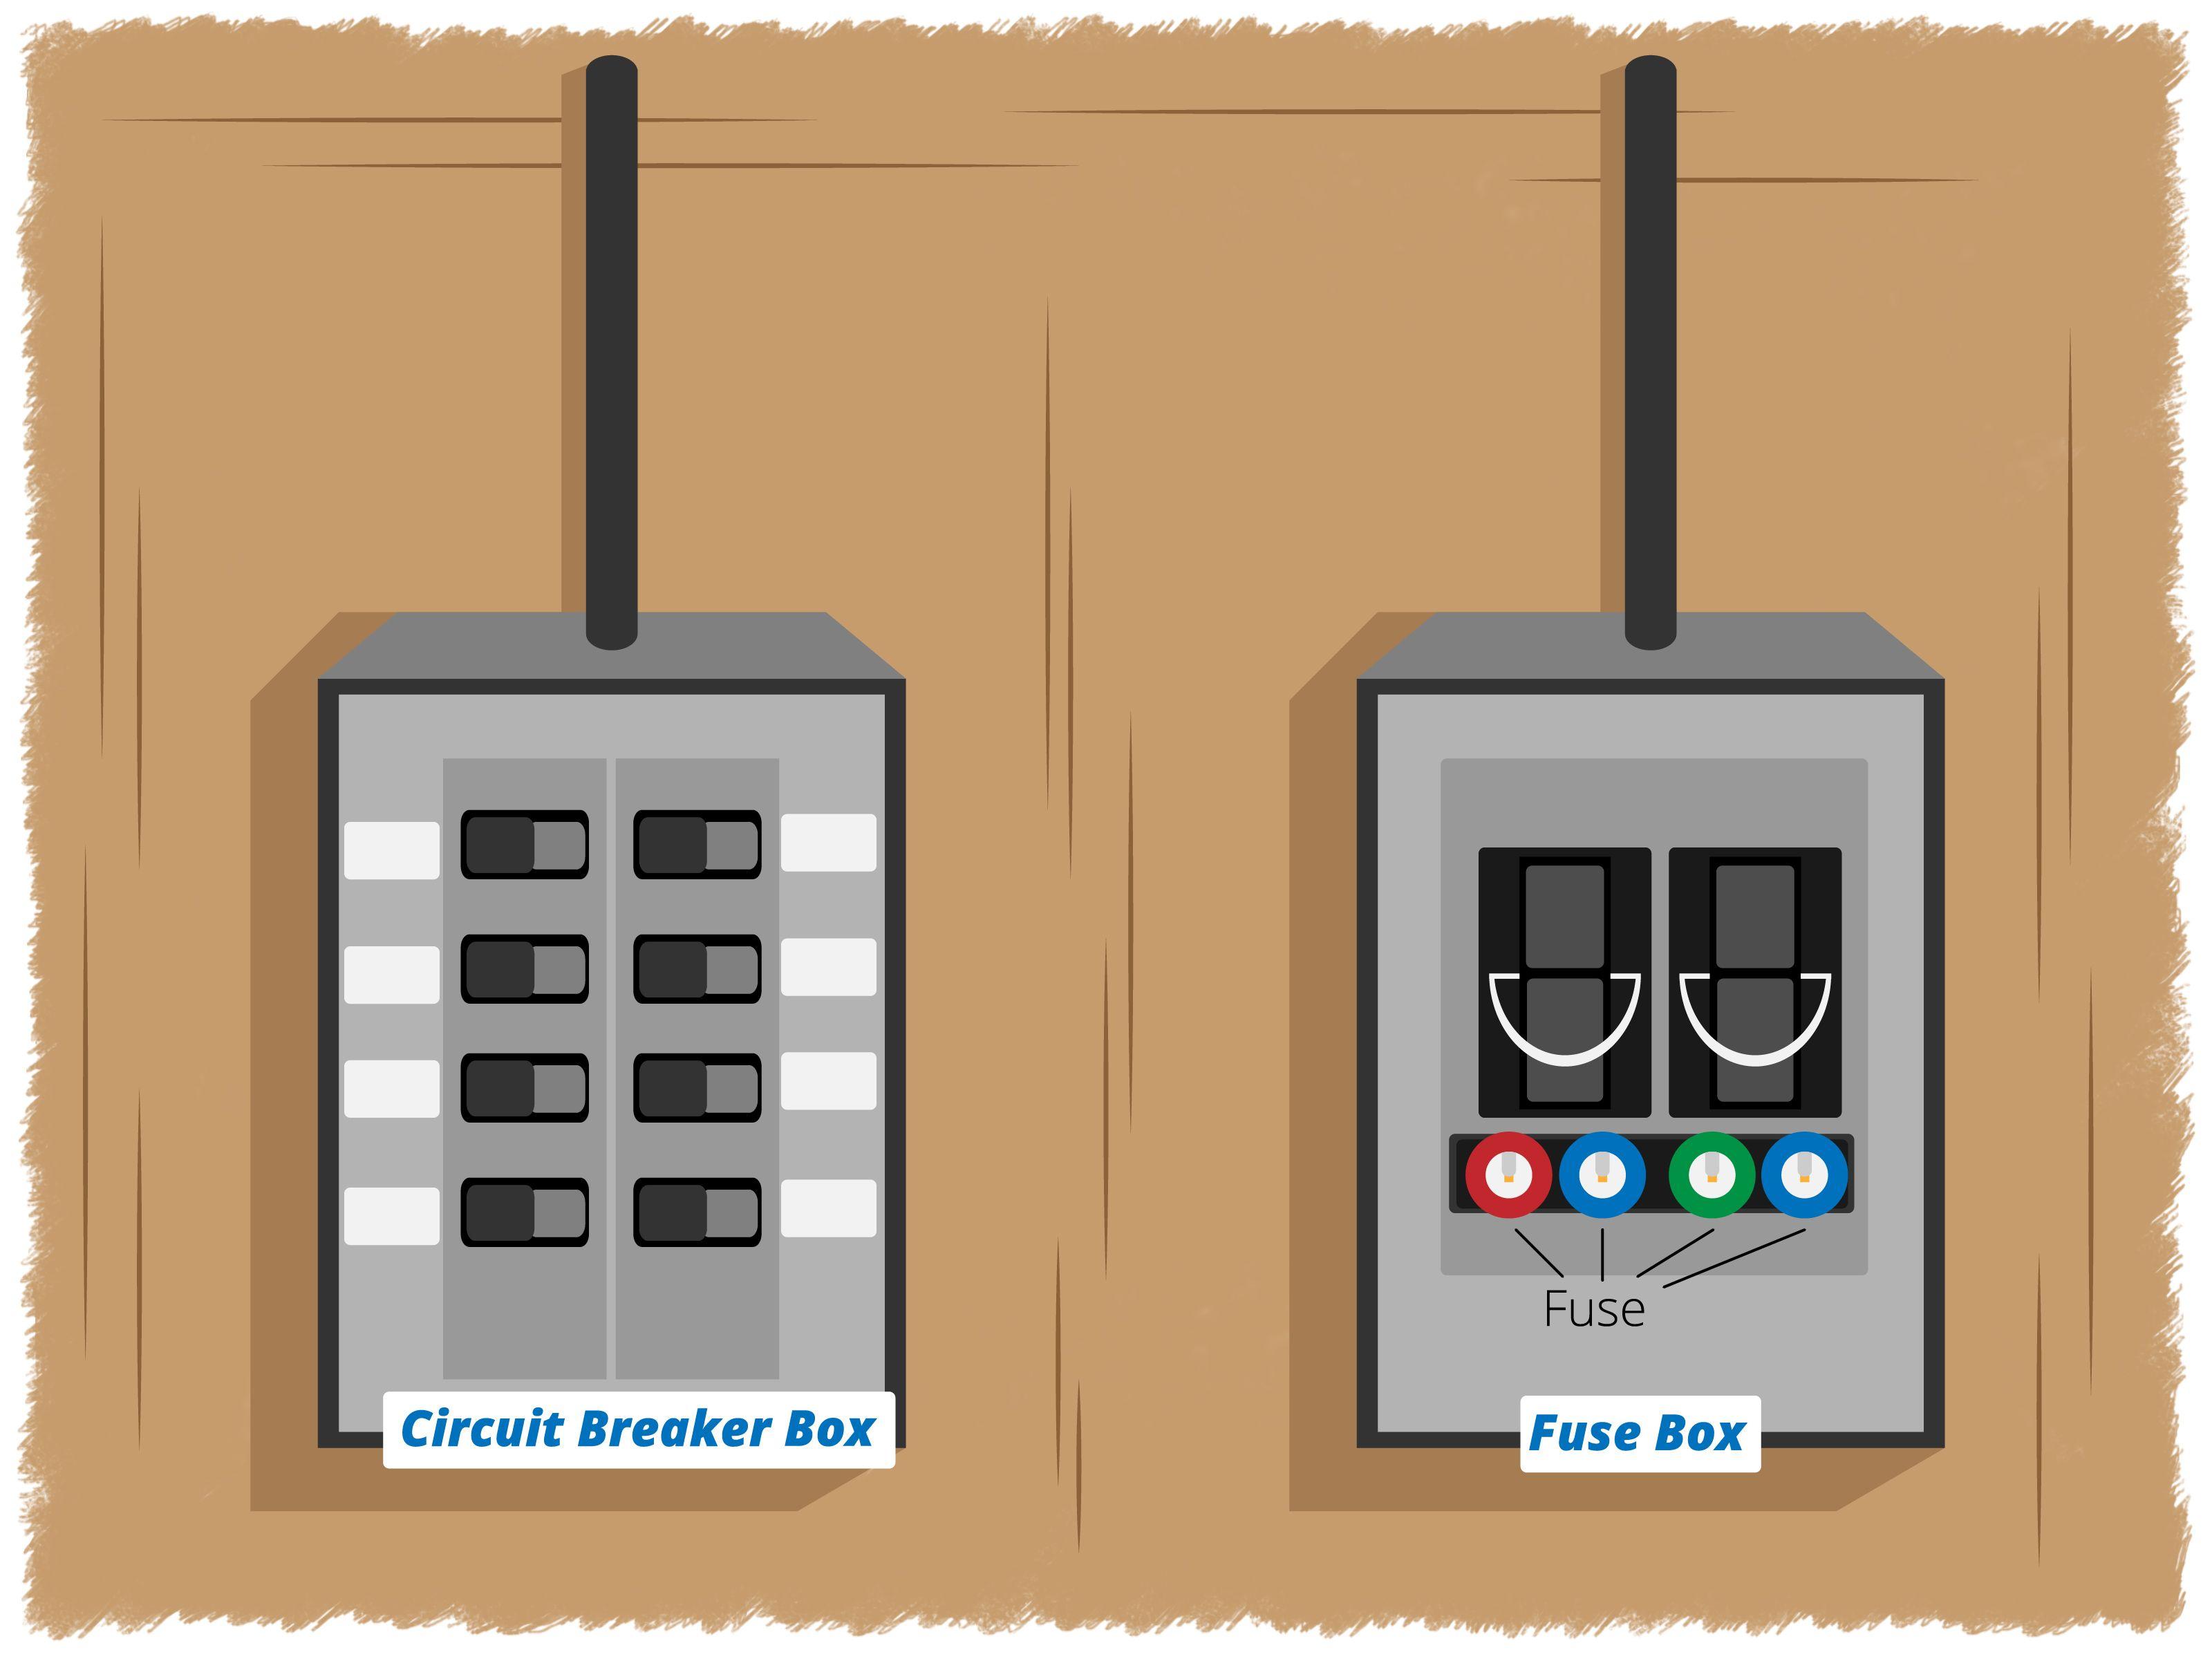 medium resolution of fuse box vs breaker wiring diagram source blown fuse circuit breaker box fuse vs circuit breaker box